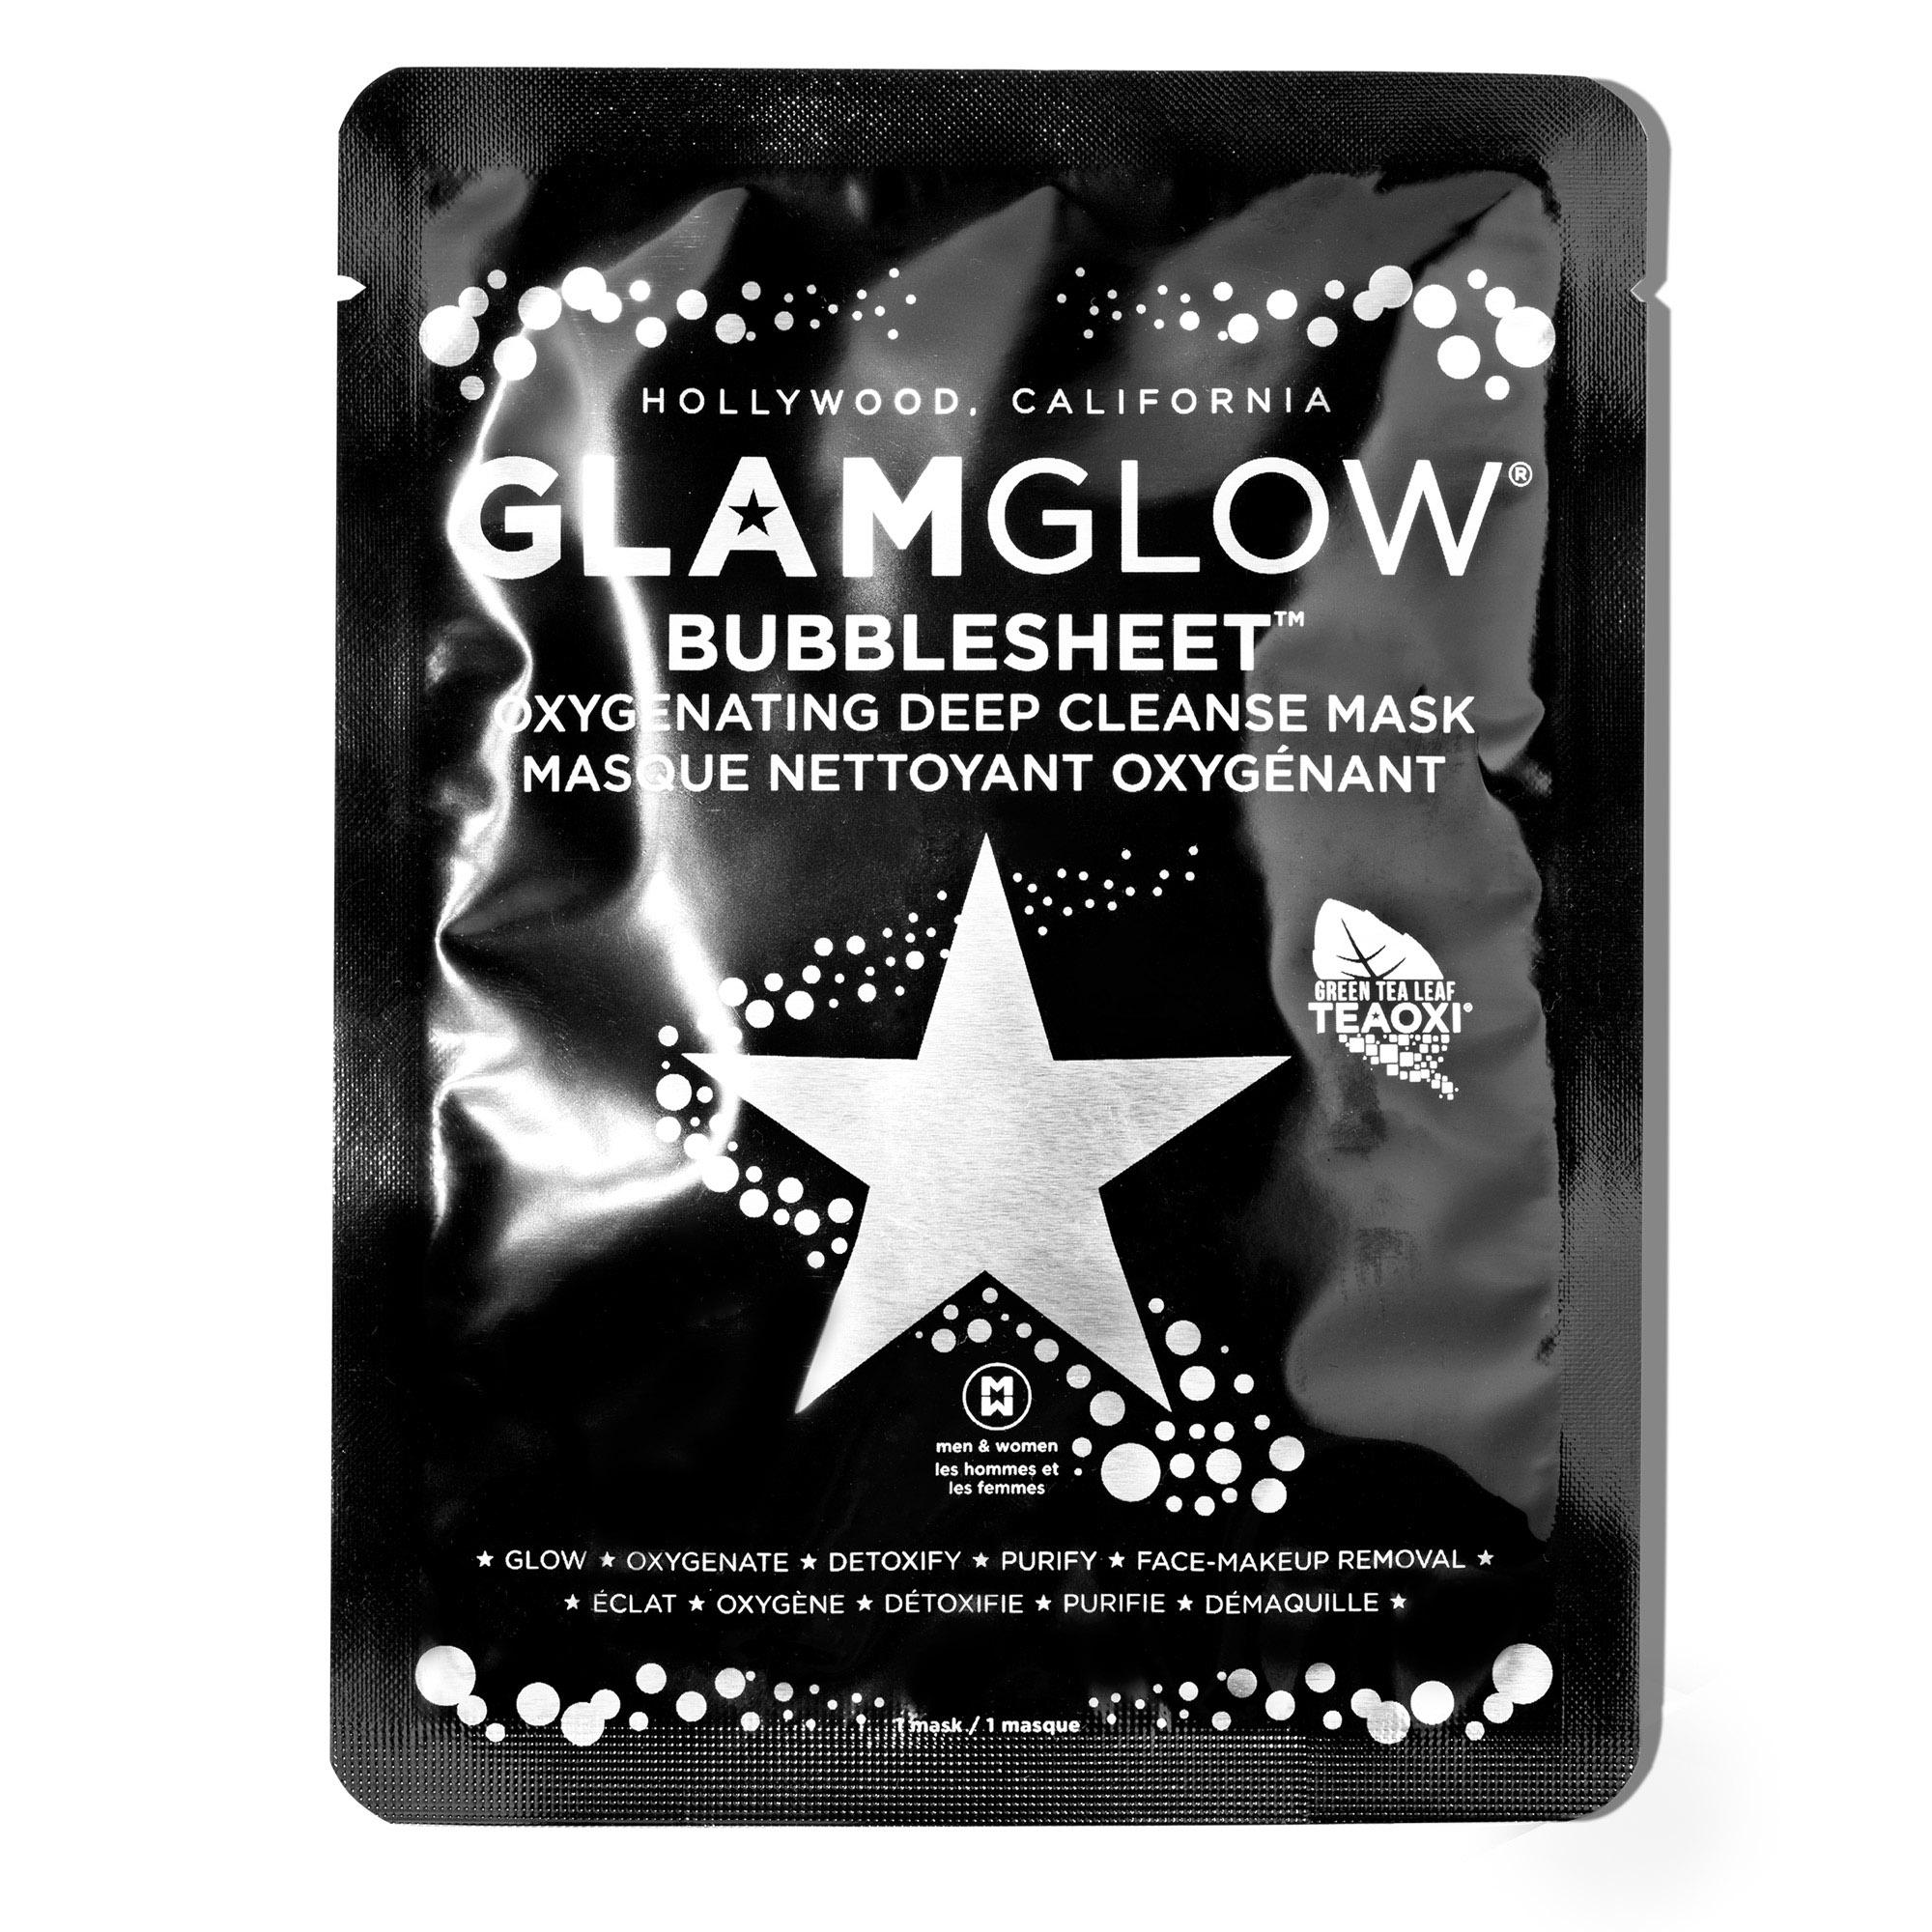 Glamglow BUBBLESHEET™ Oxygenating Deep Cleanse Mask